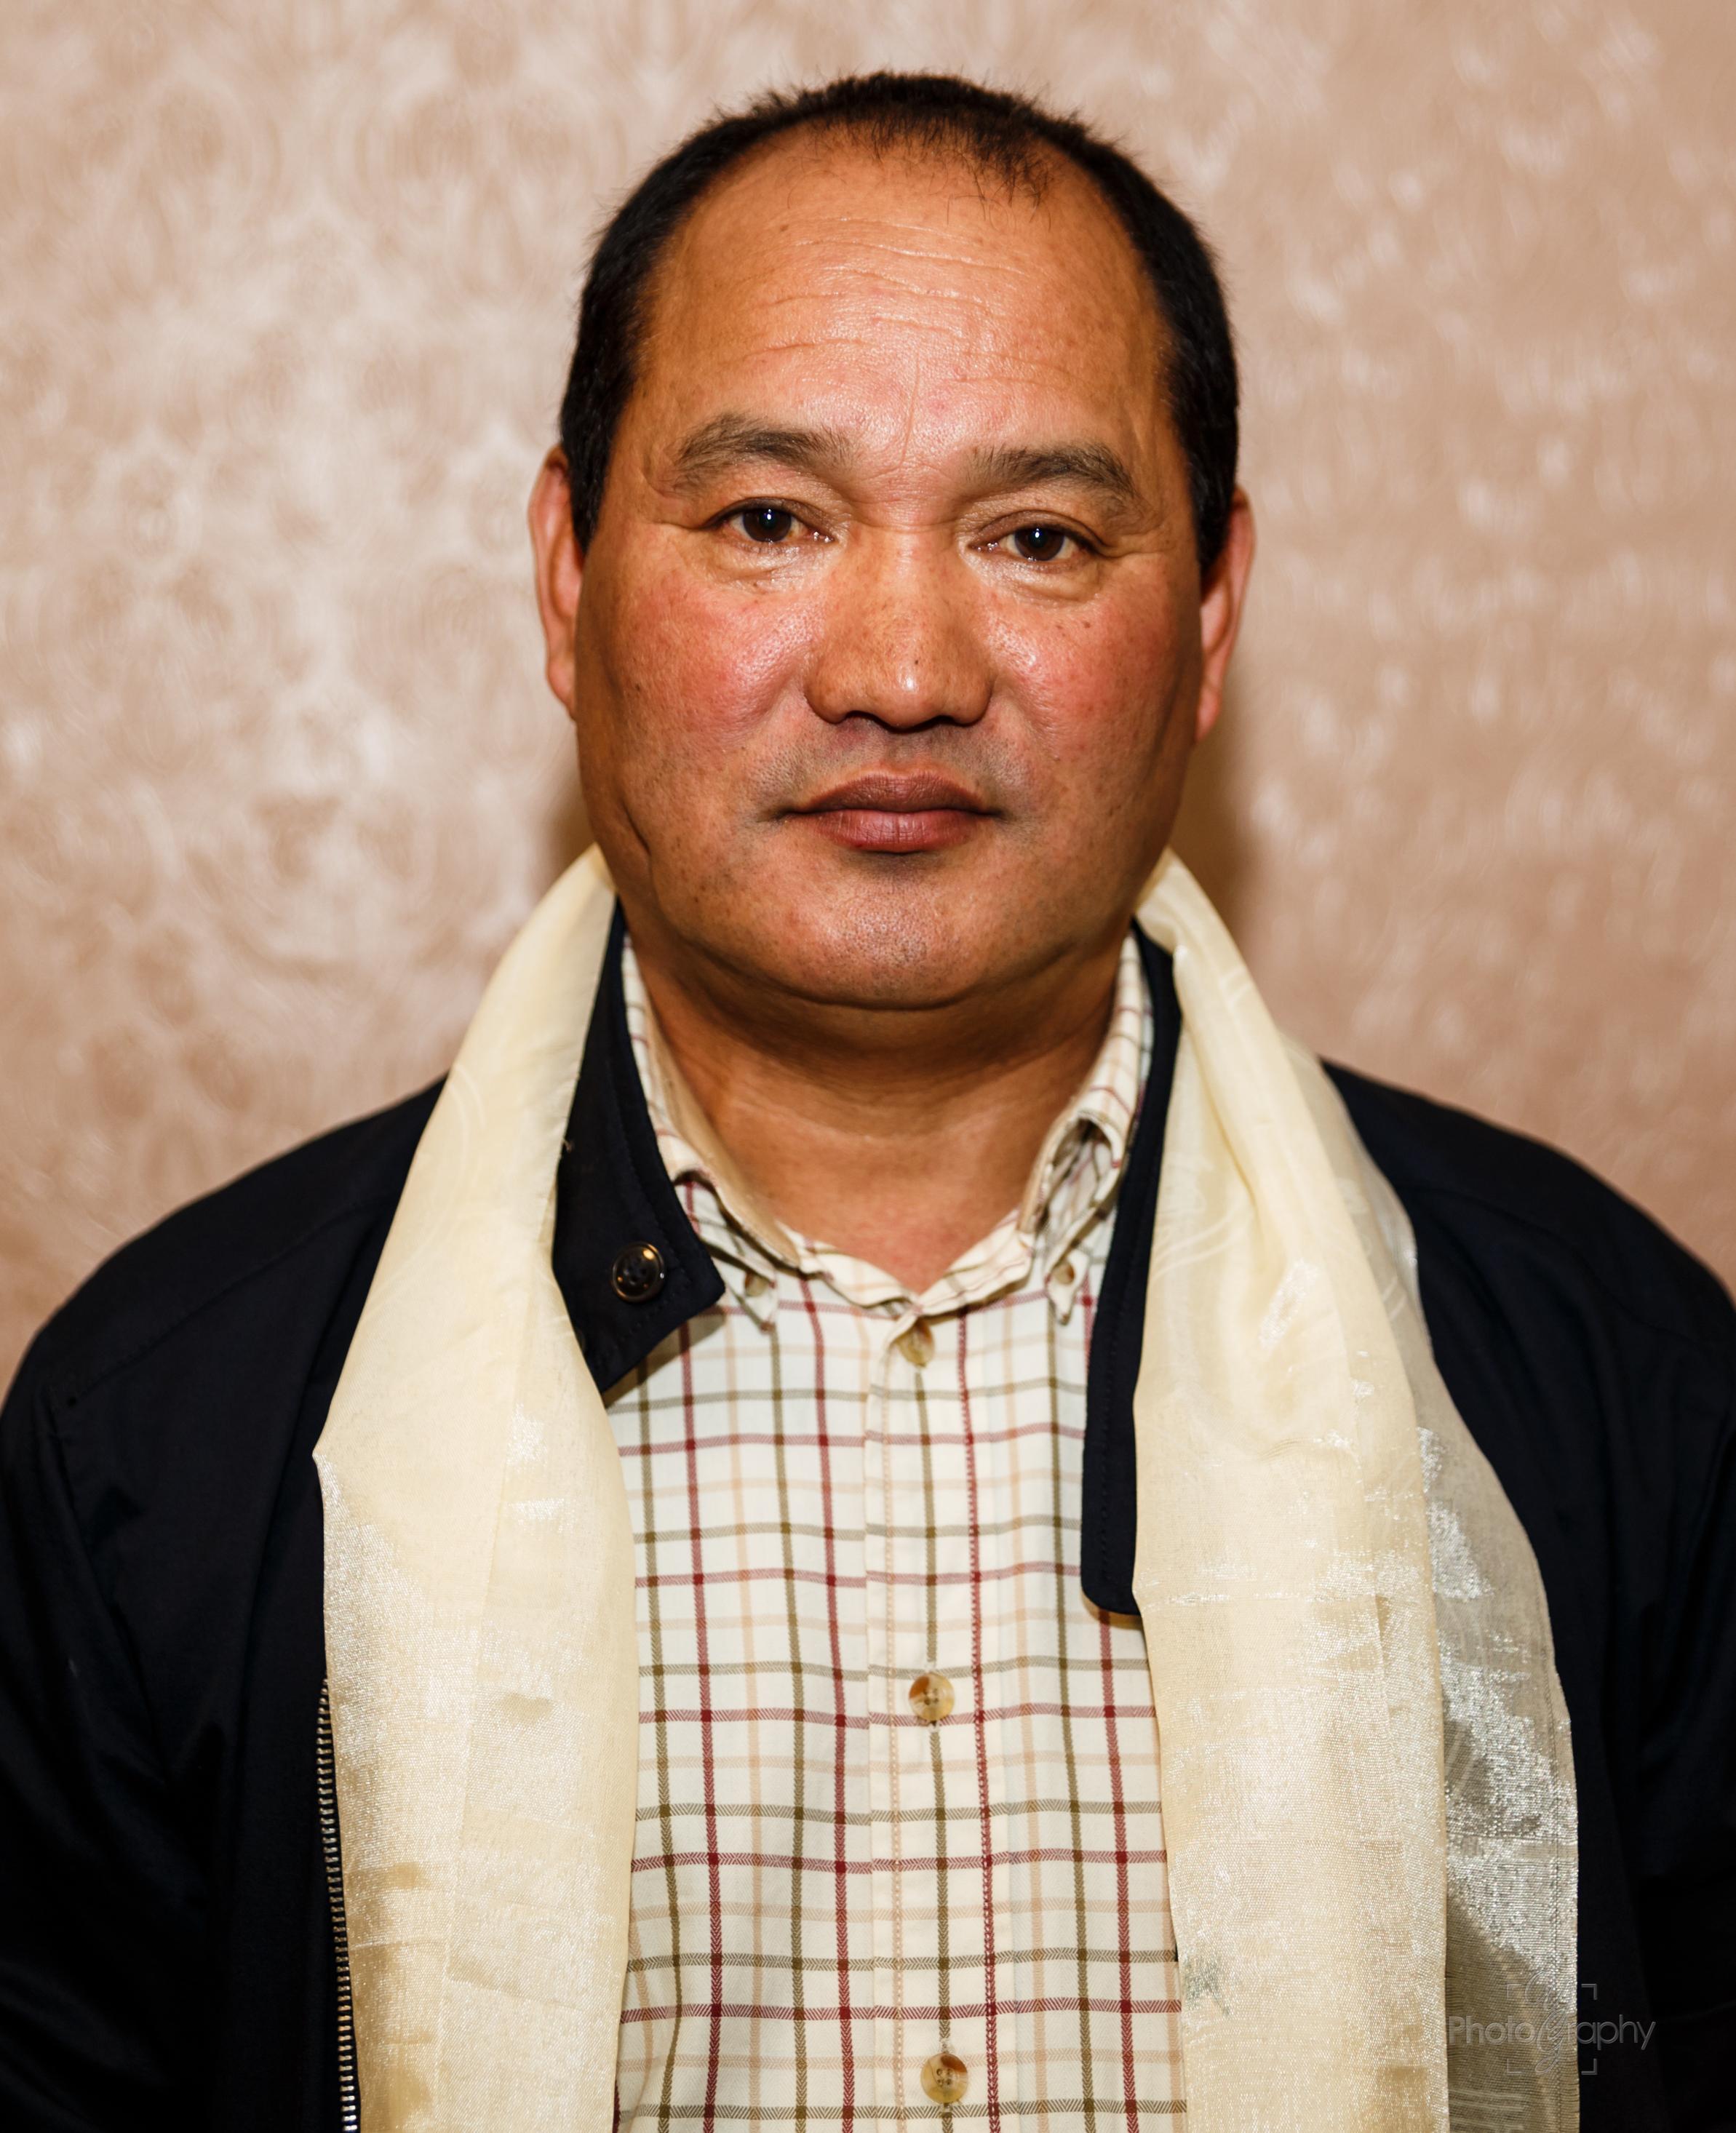 Kanya Prasad Gurung